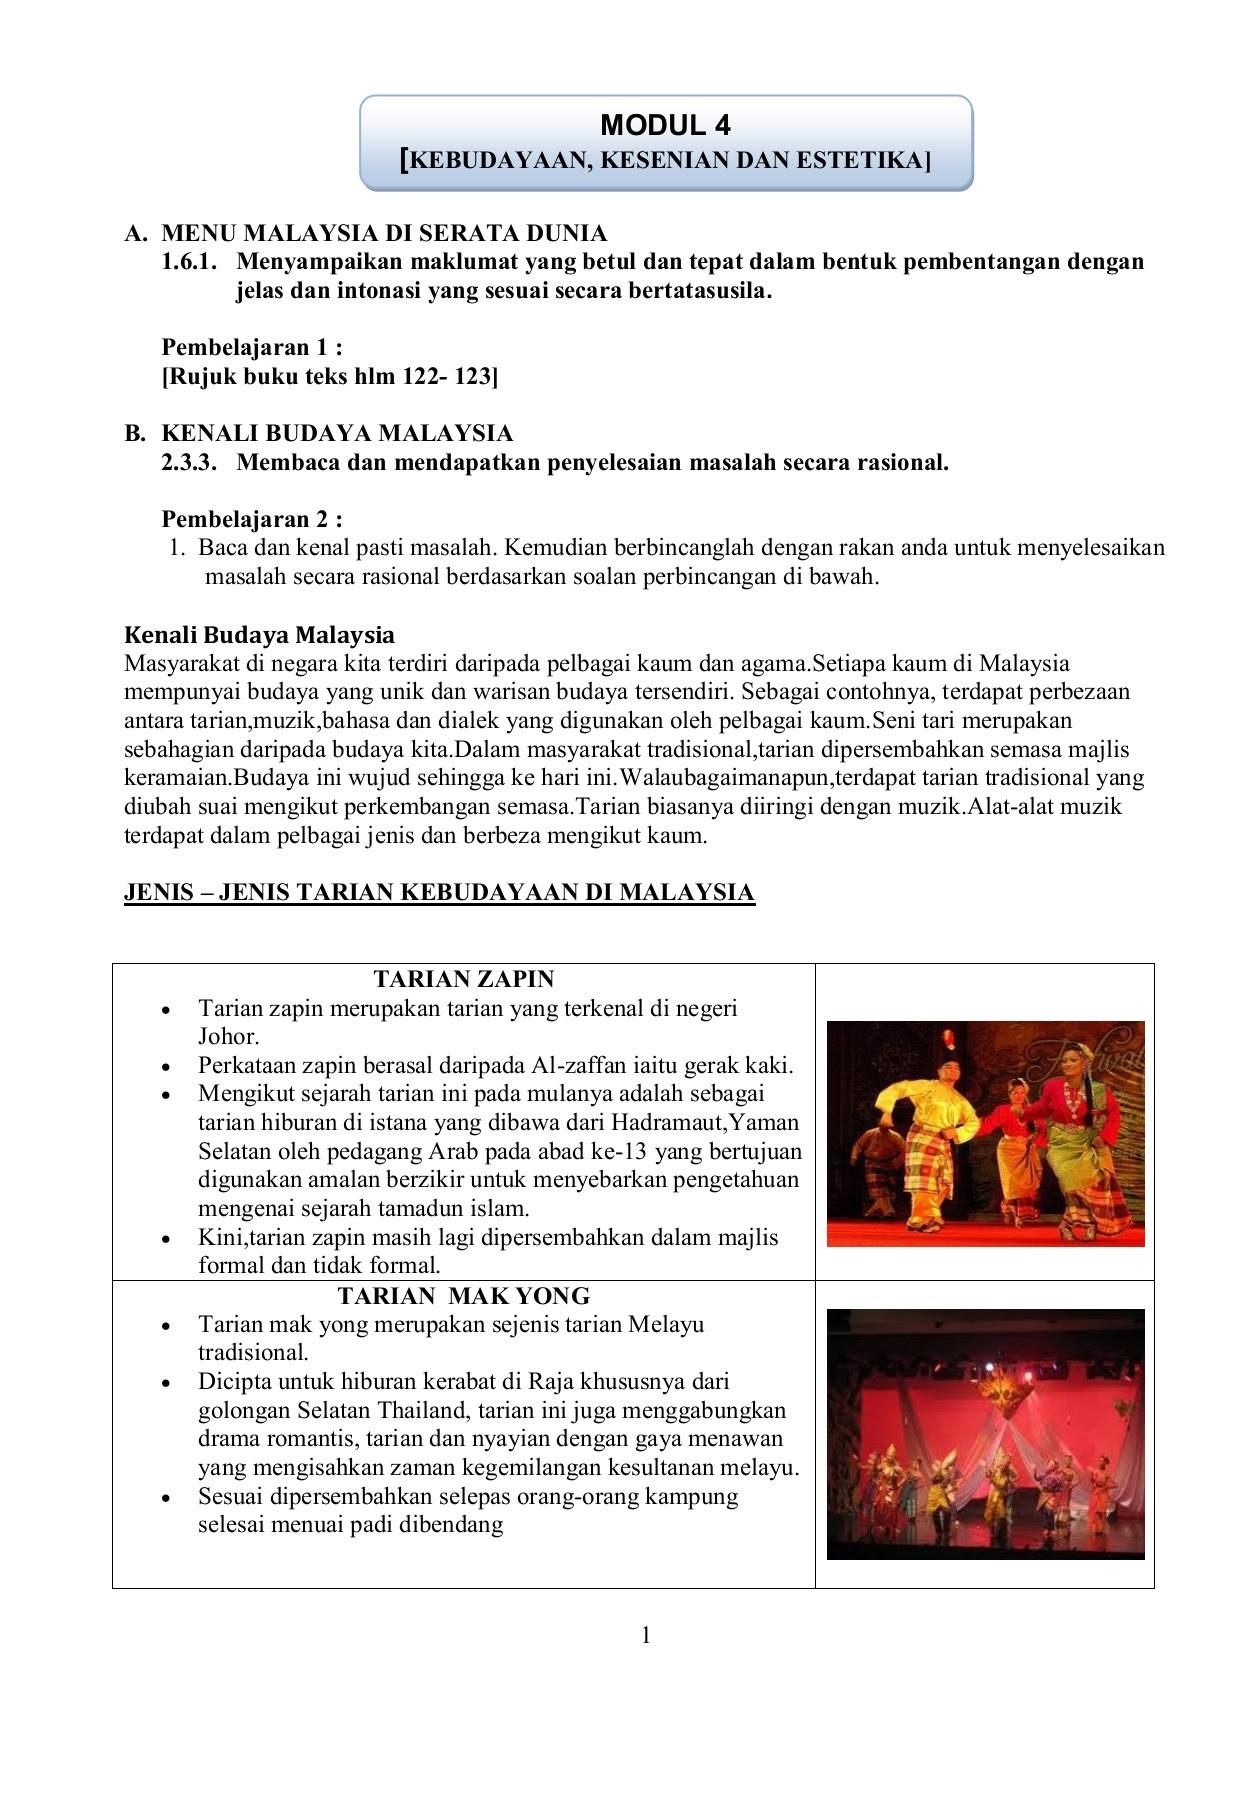 Tema 4 Kebudayaan Kesenian Dan Estetika Pages 1 15 Text Version Anyflip